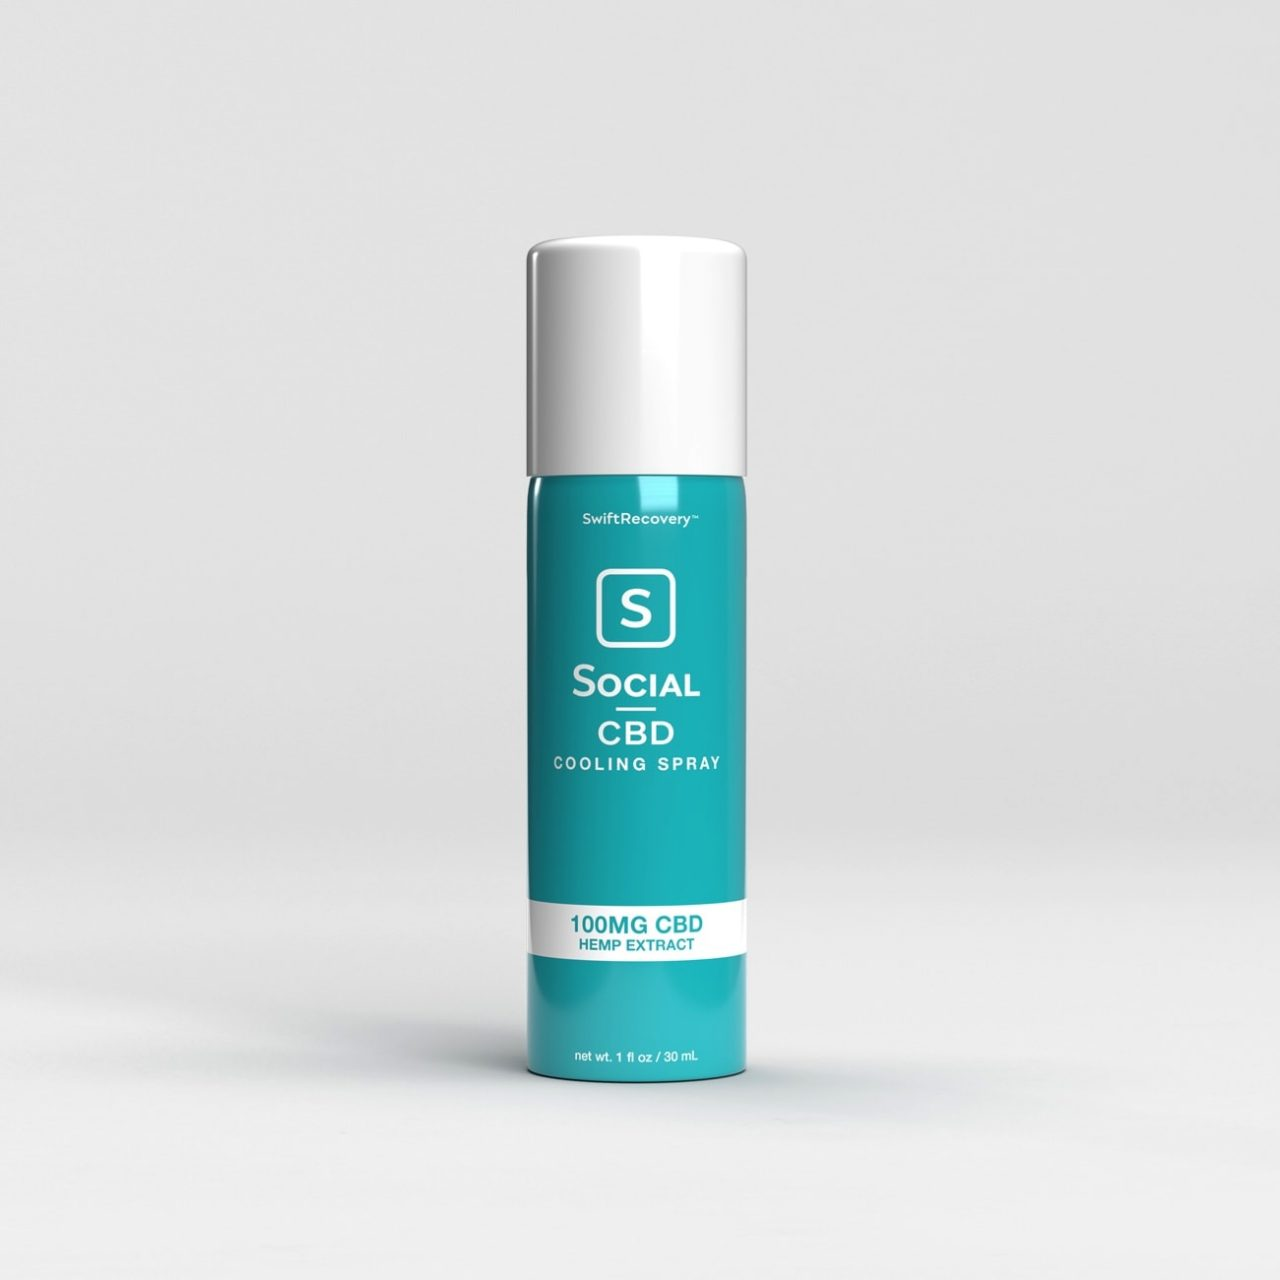 Social CBD, Cooling Spray 100MG, Isolate THC-Free, 1oz, 100mg CBD 1